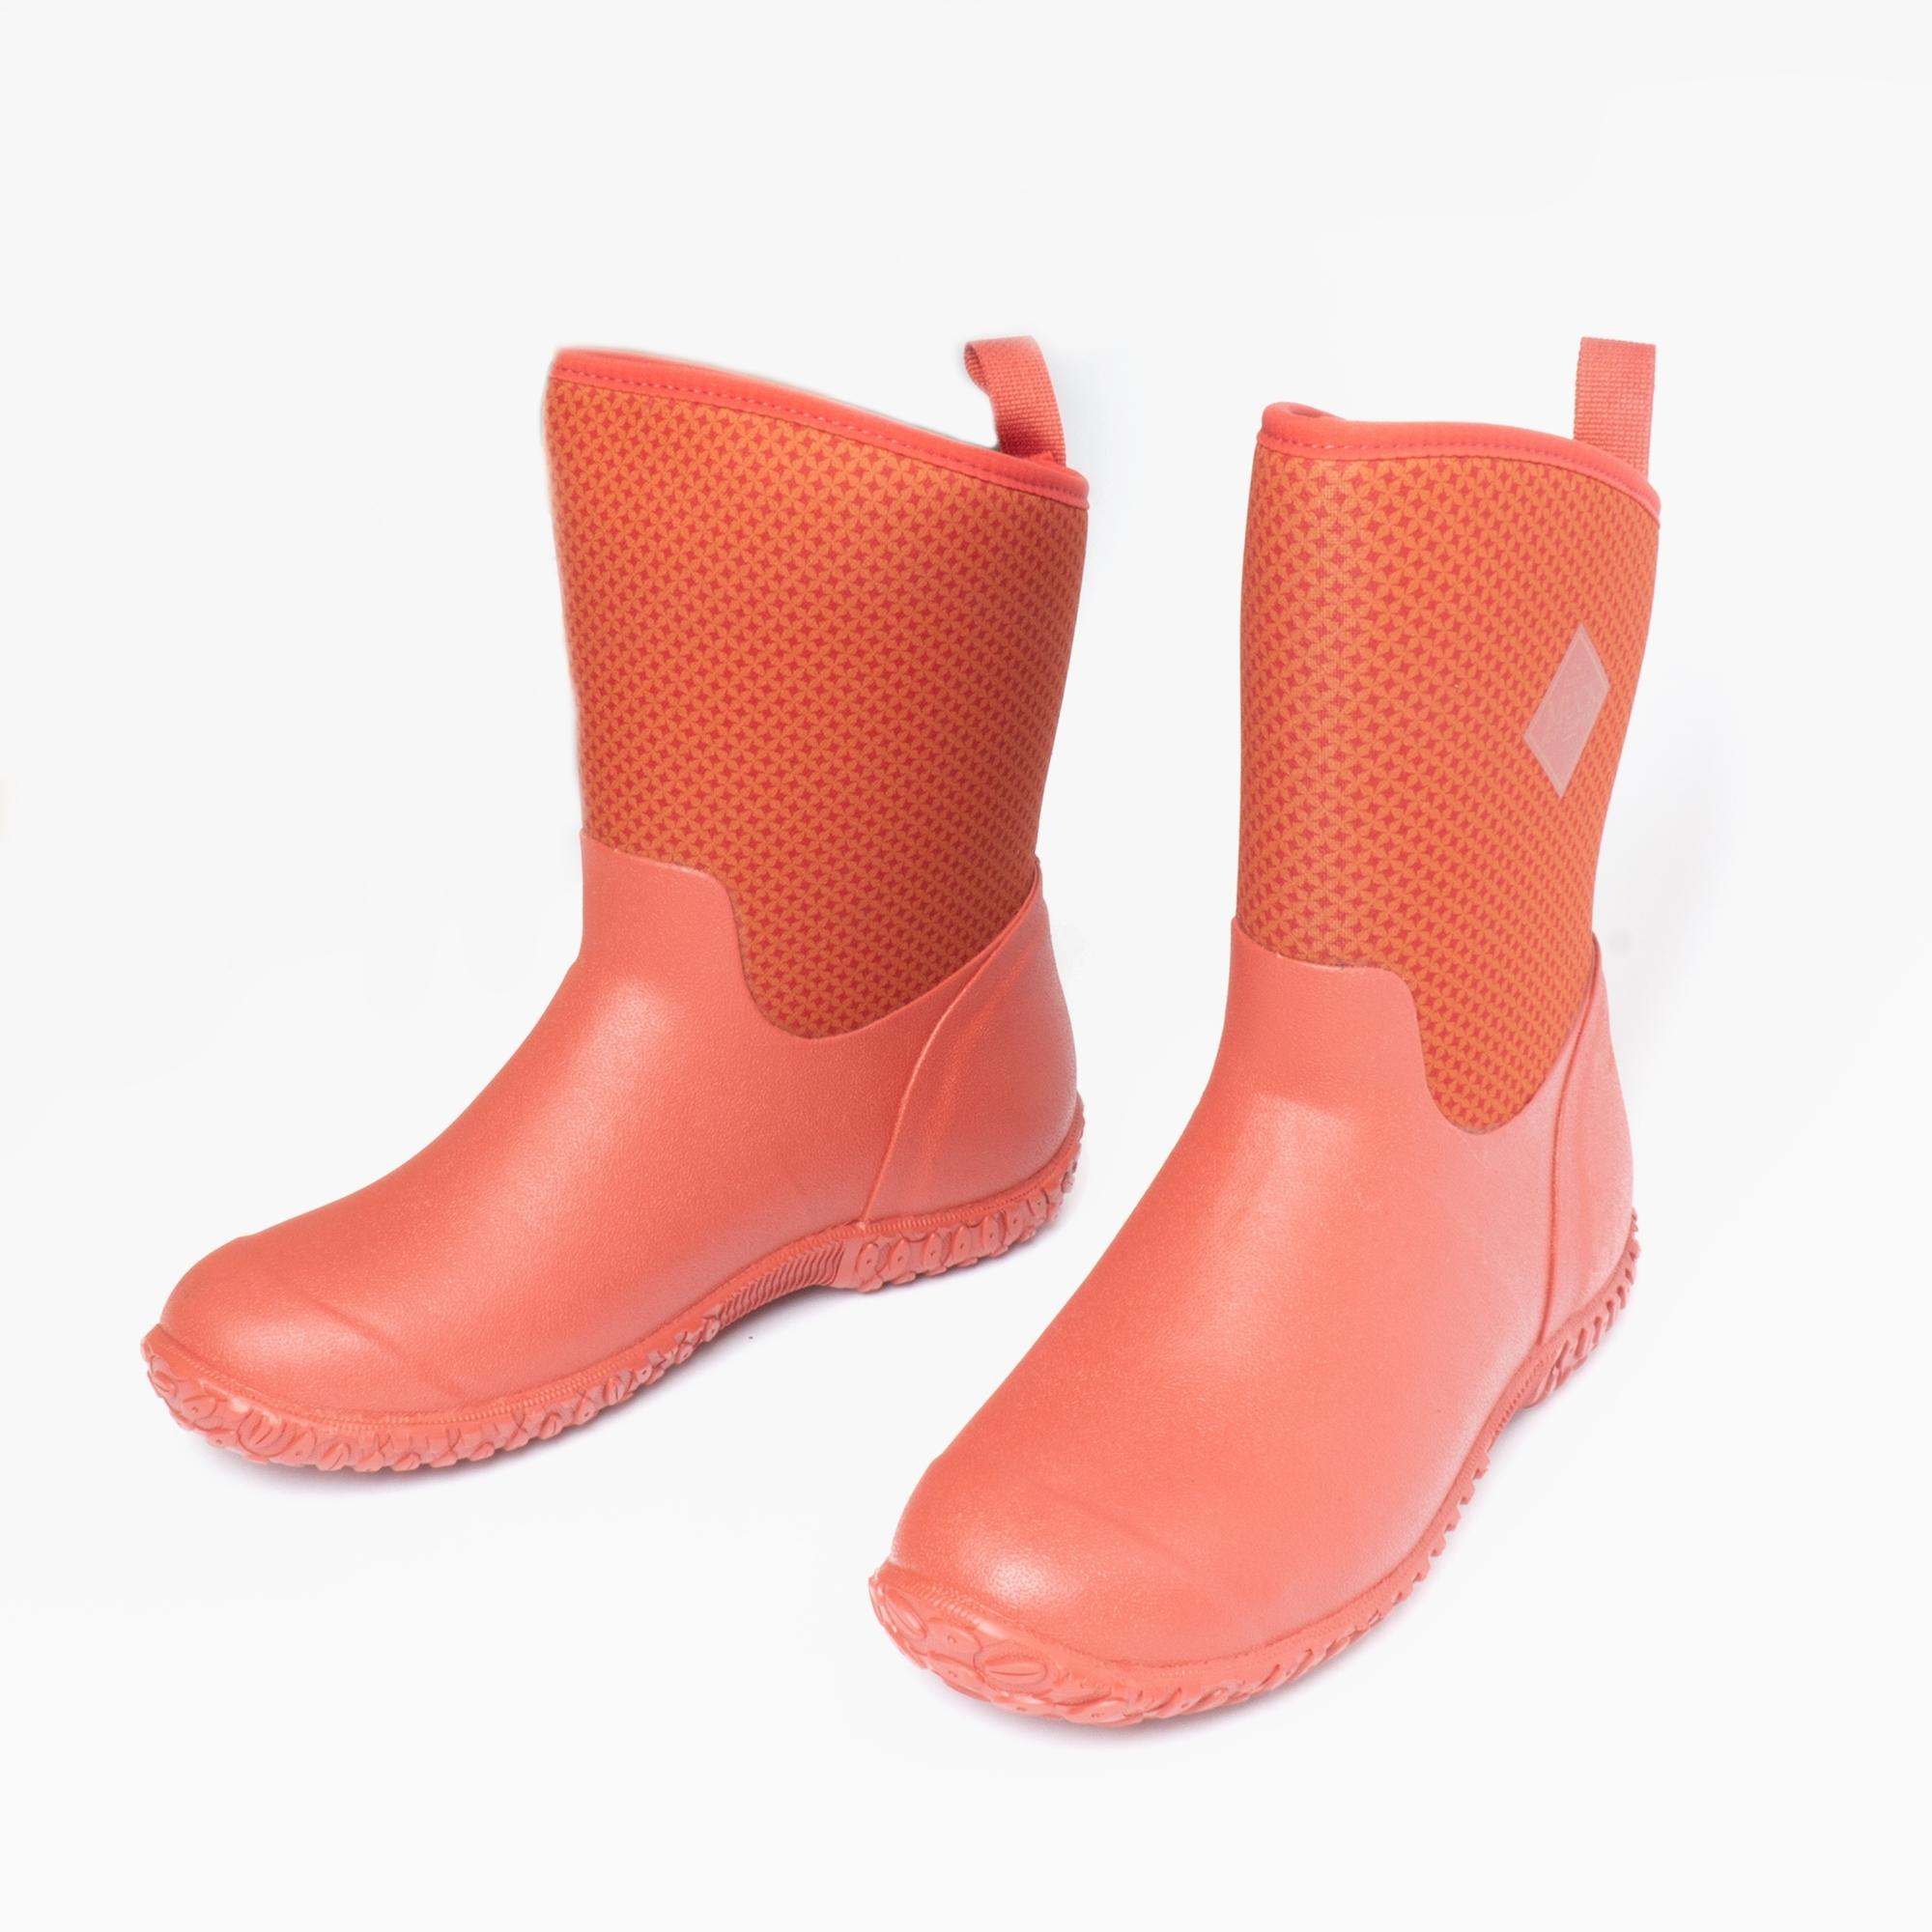 Muck Boots RHS MUCKSTER II SHORT Ladies Womens Neoprene Wellington Boots Red